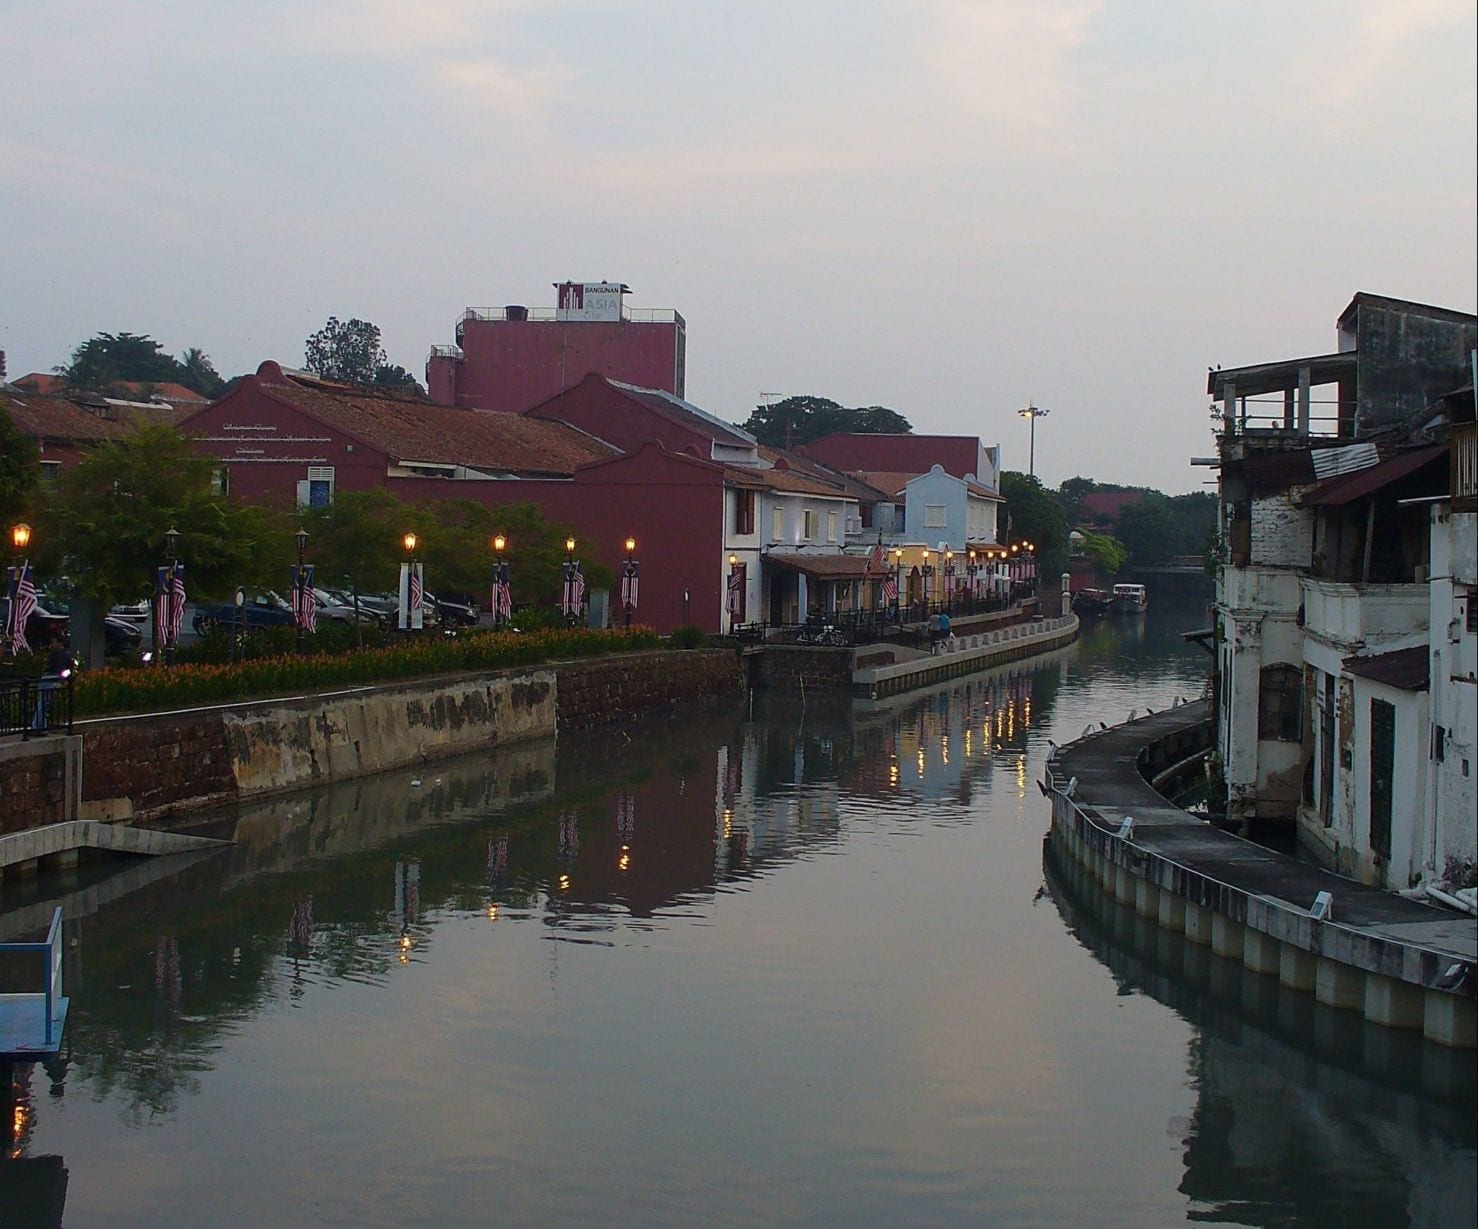 Río Malaca al atardecer Malacca Malasia